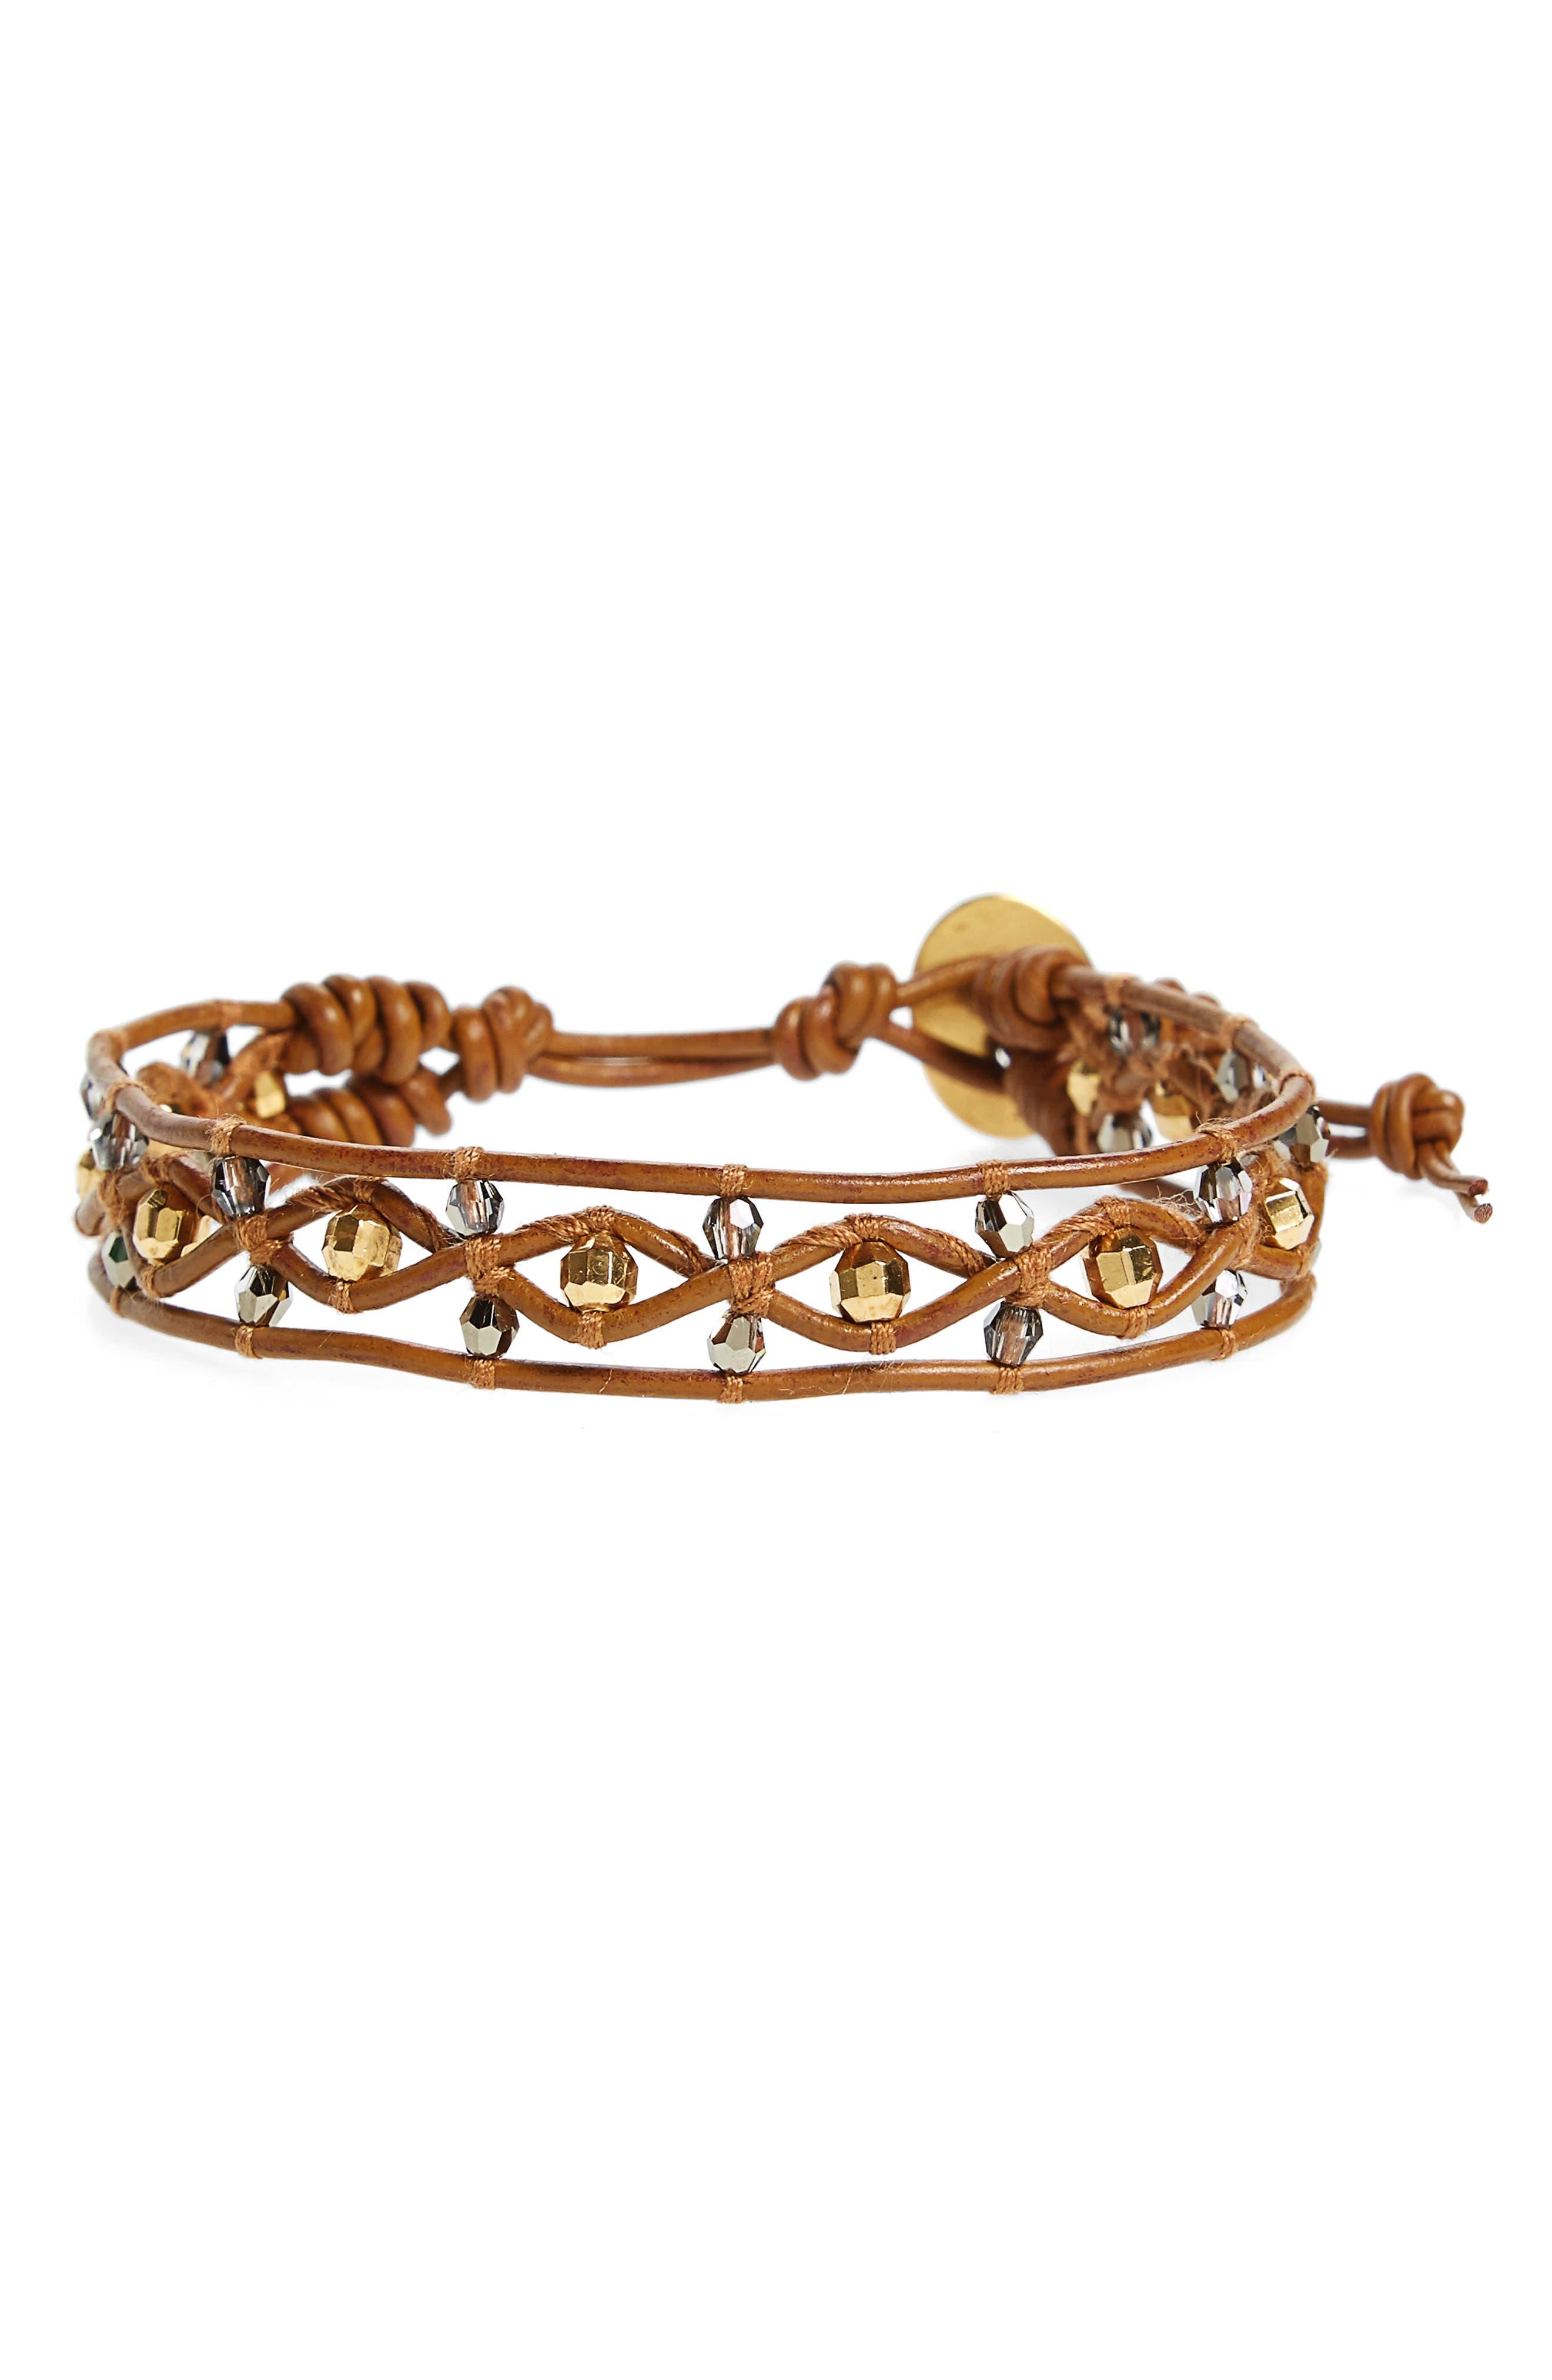 Beaded Leather Bracelet,                         Main,                         color, Gold